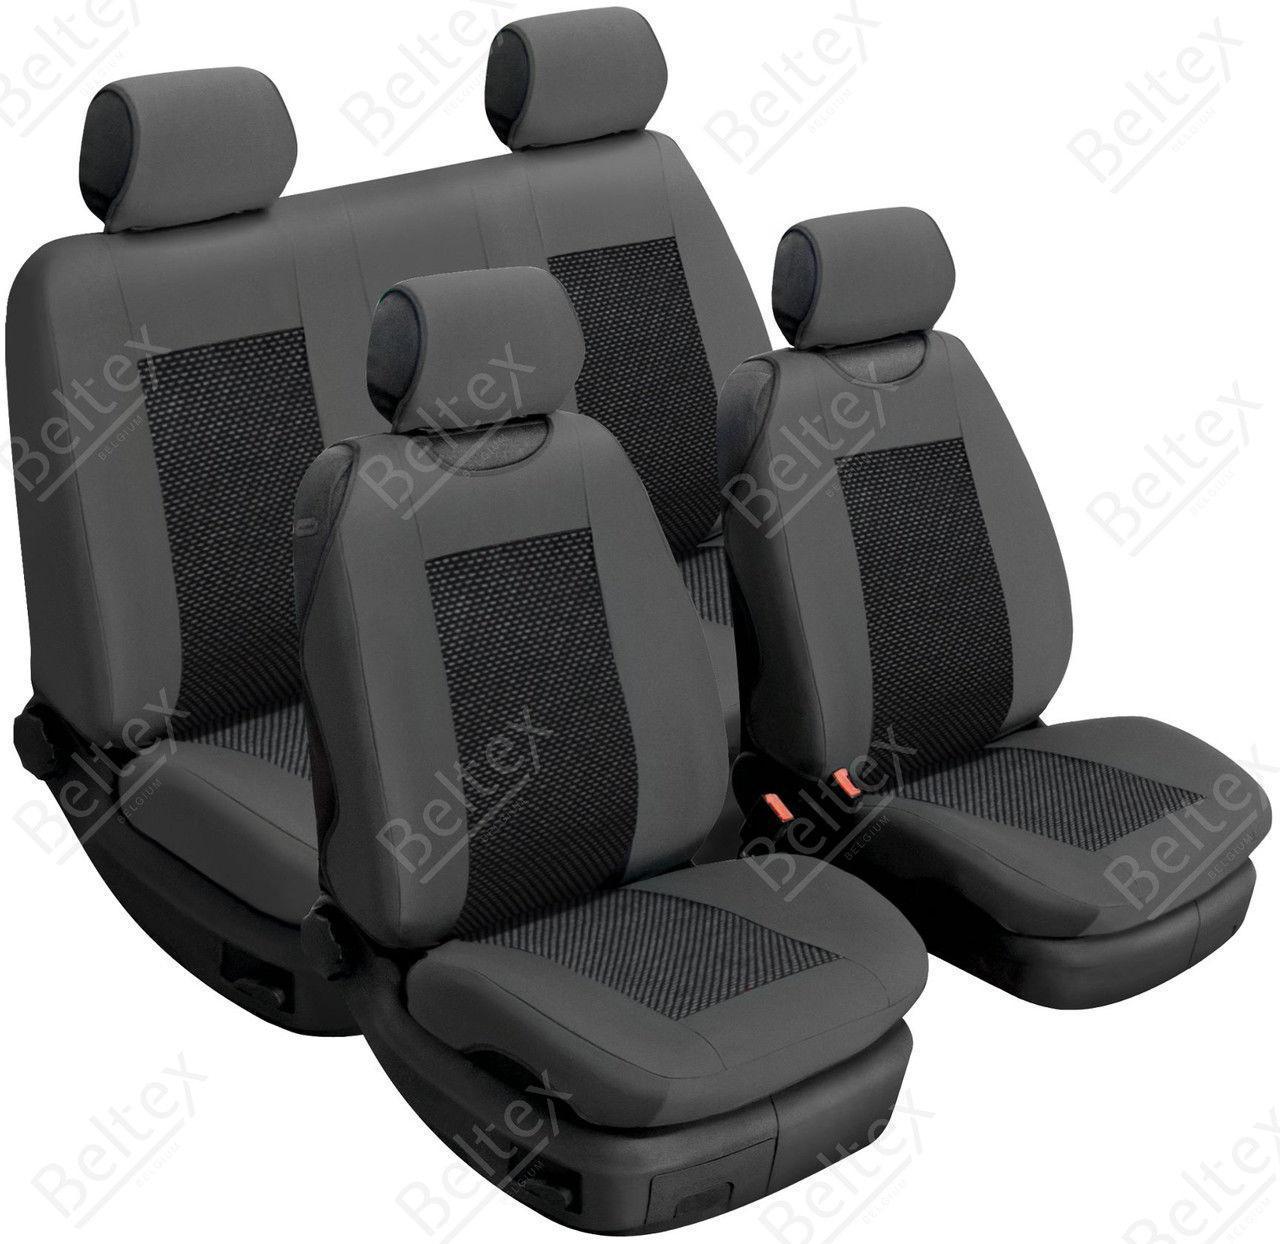 Майки/чехлы на сиденья Опель Зафира А (Opel Zafira A)